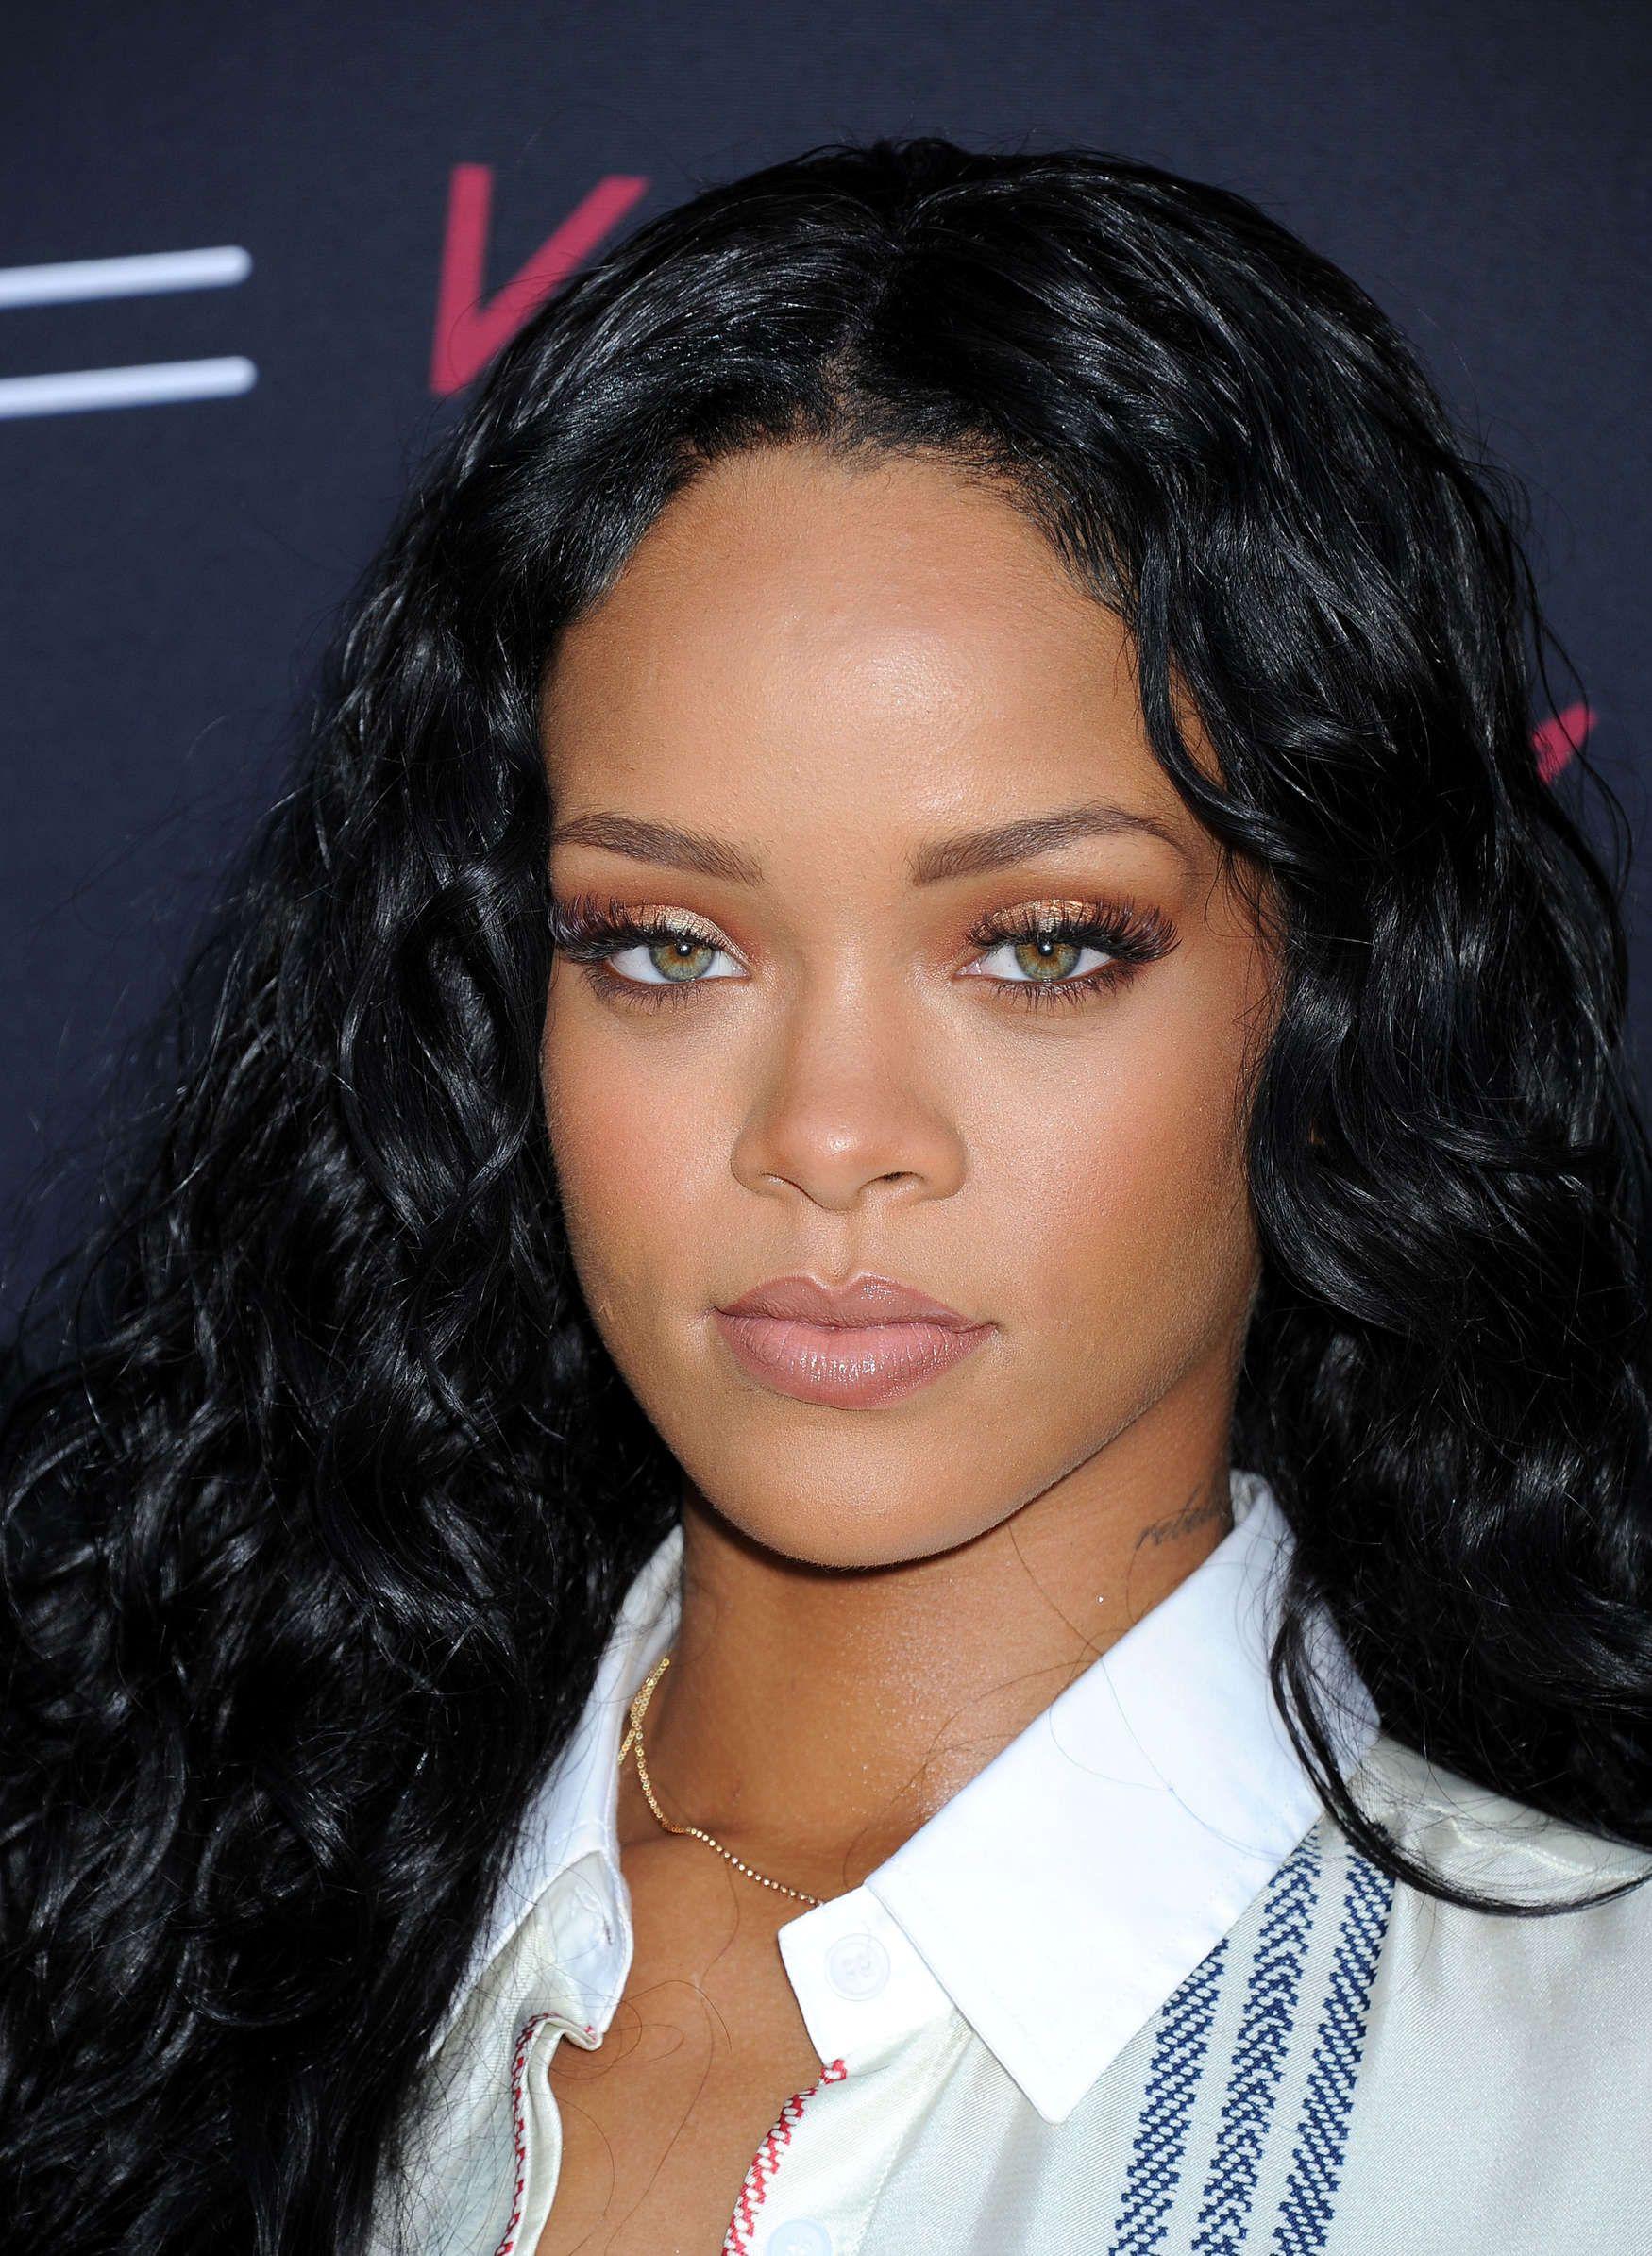 Google themes rihanna - Rihanna Images 2014 Google Search